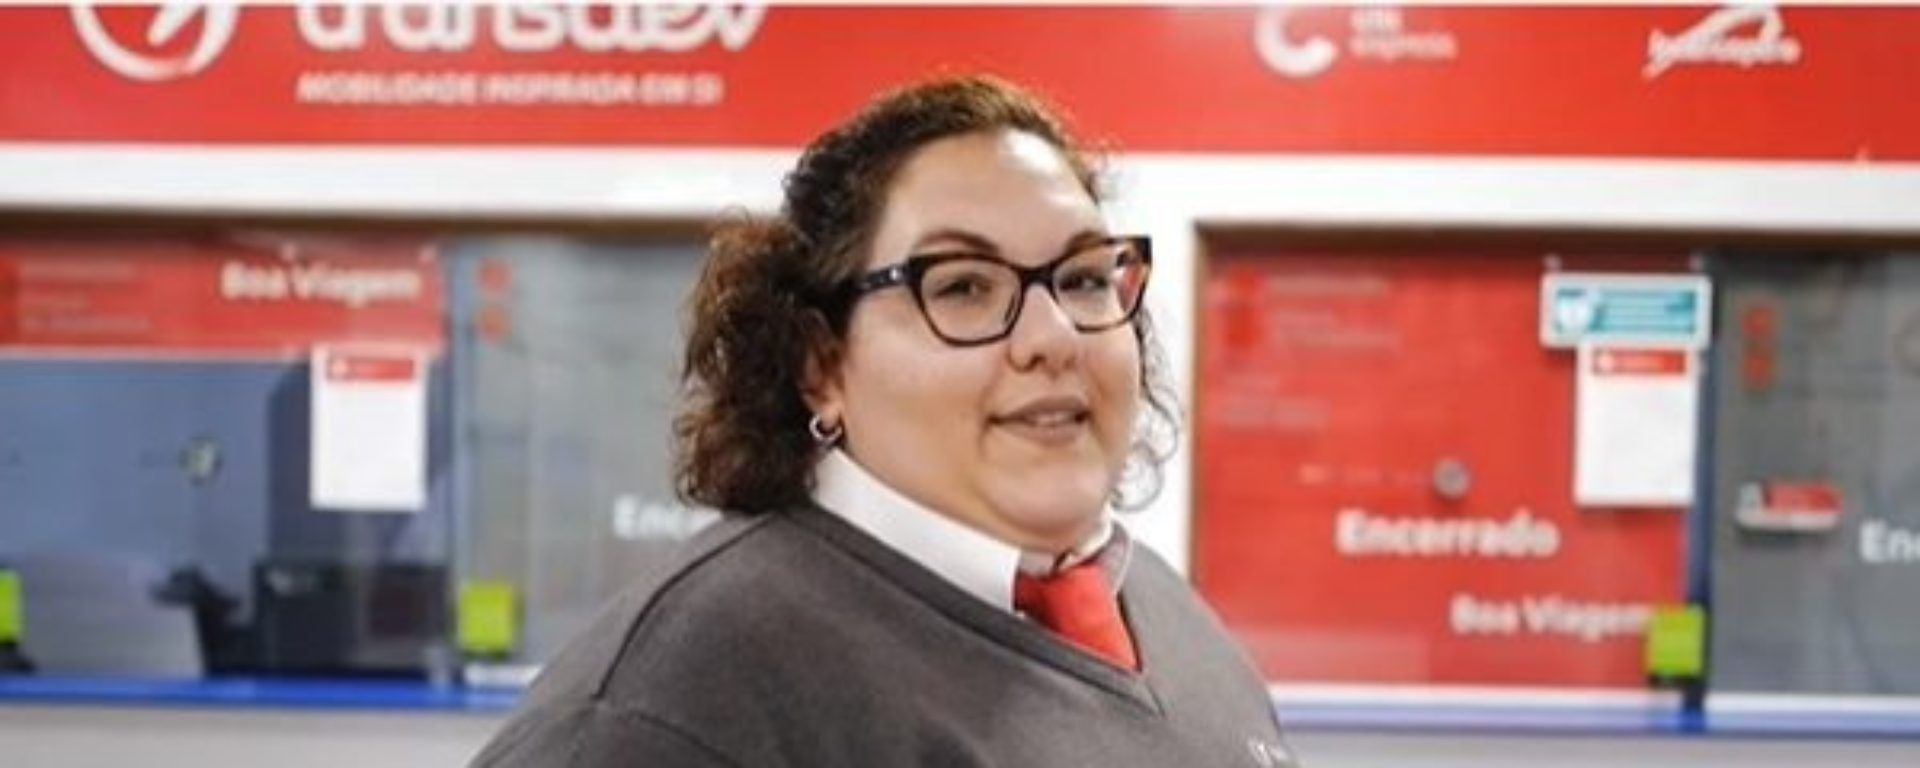 Transdev_Portugal_employee